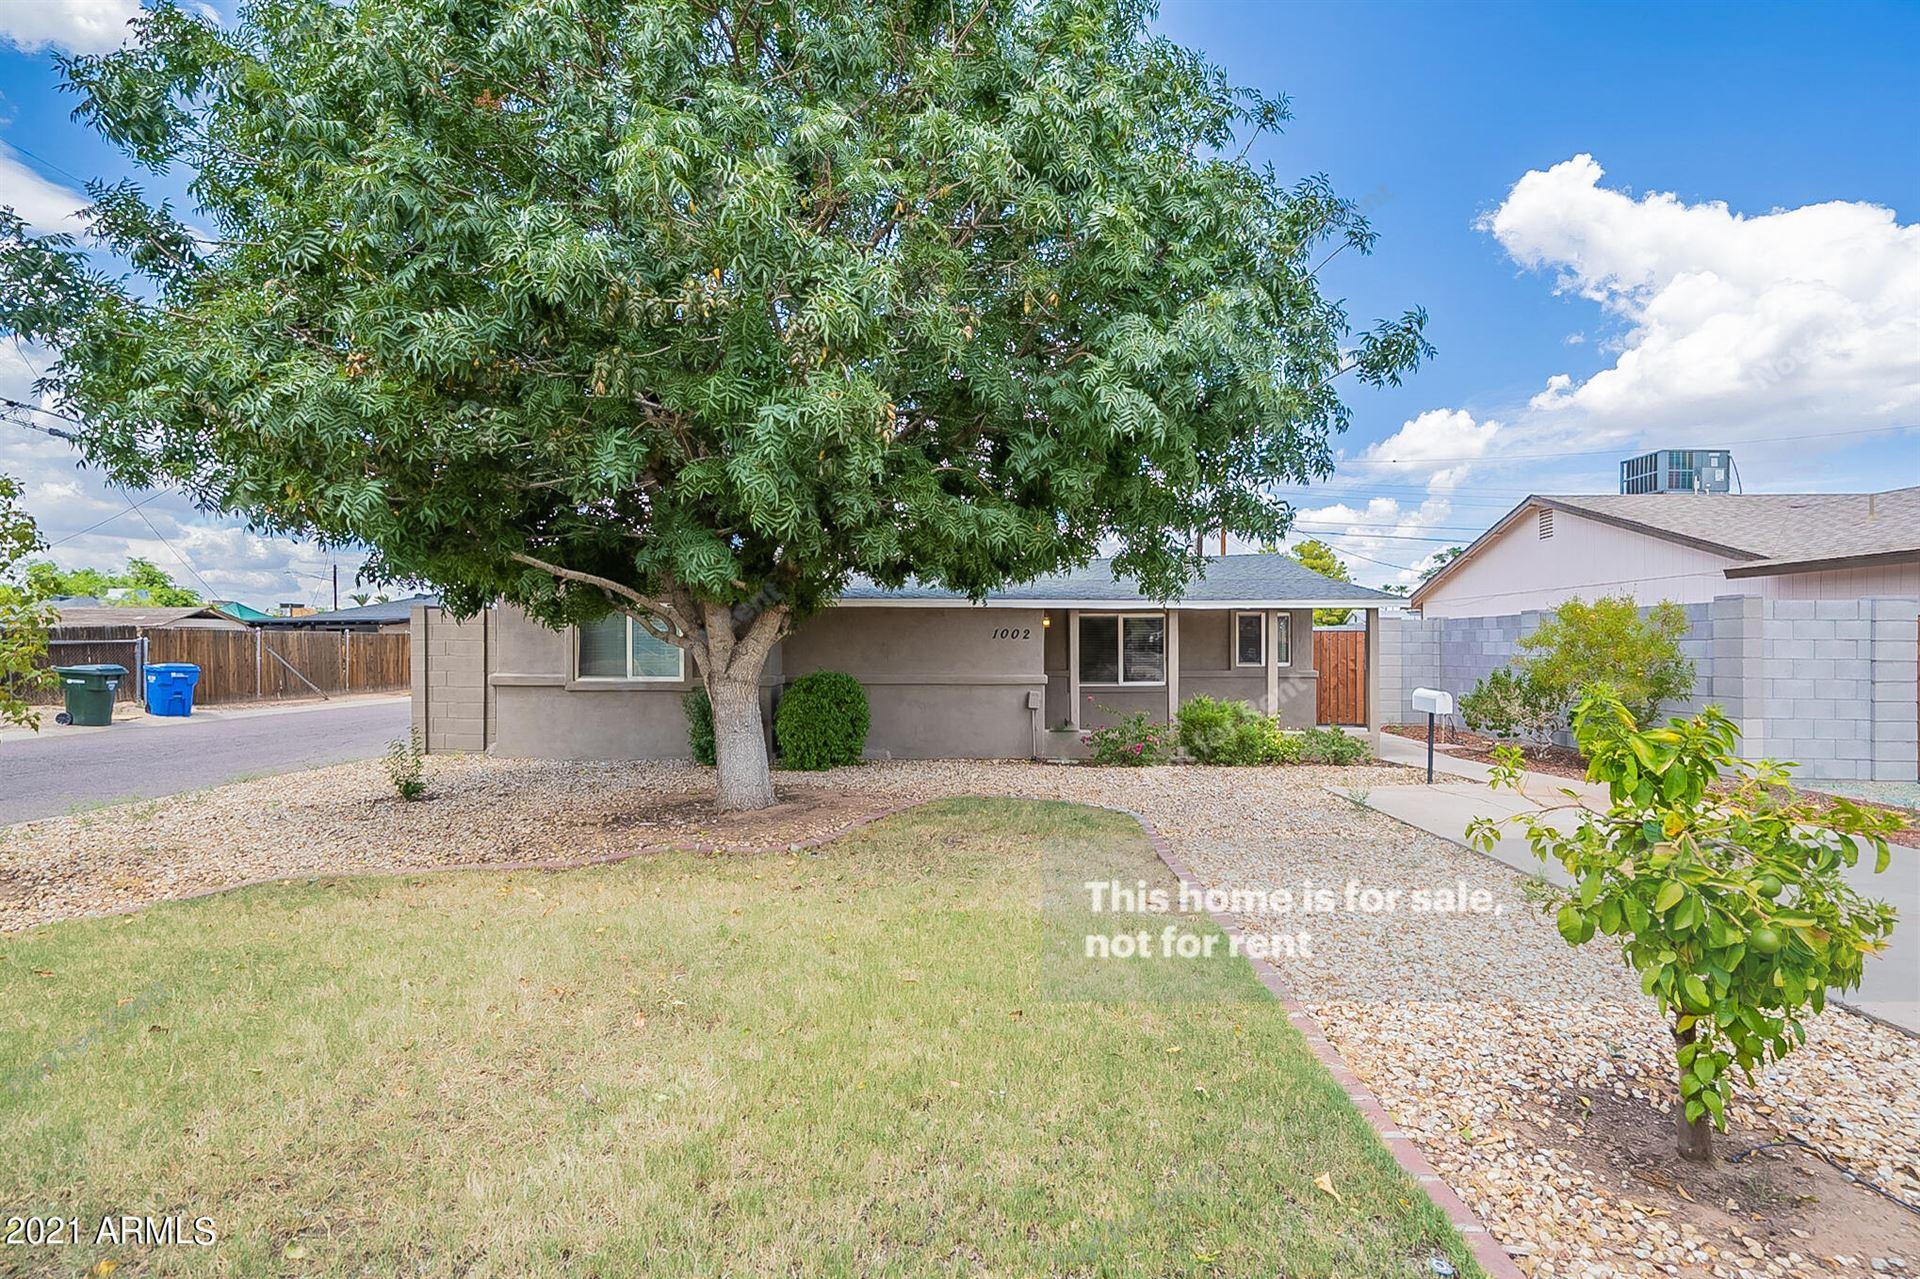 1002 E CLARENDON Avenue, Phoenix, AZ 85014 - MLS#: 6279026